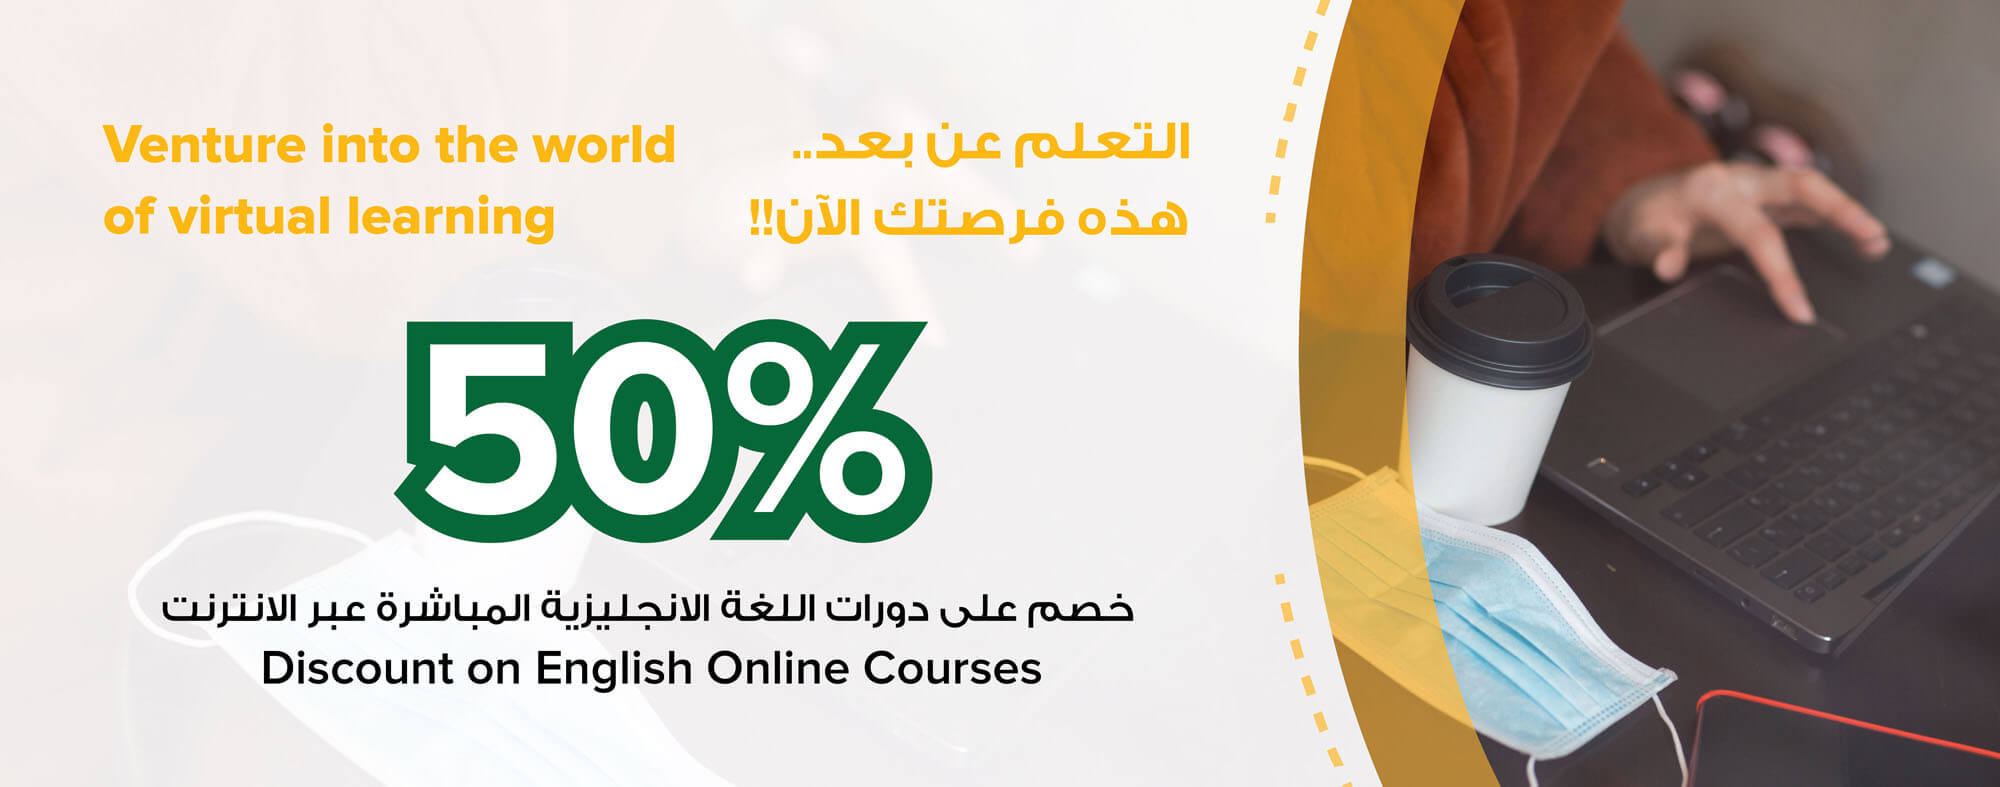 english-onlinee